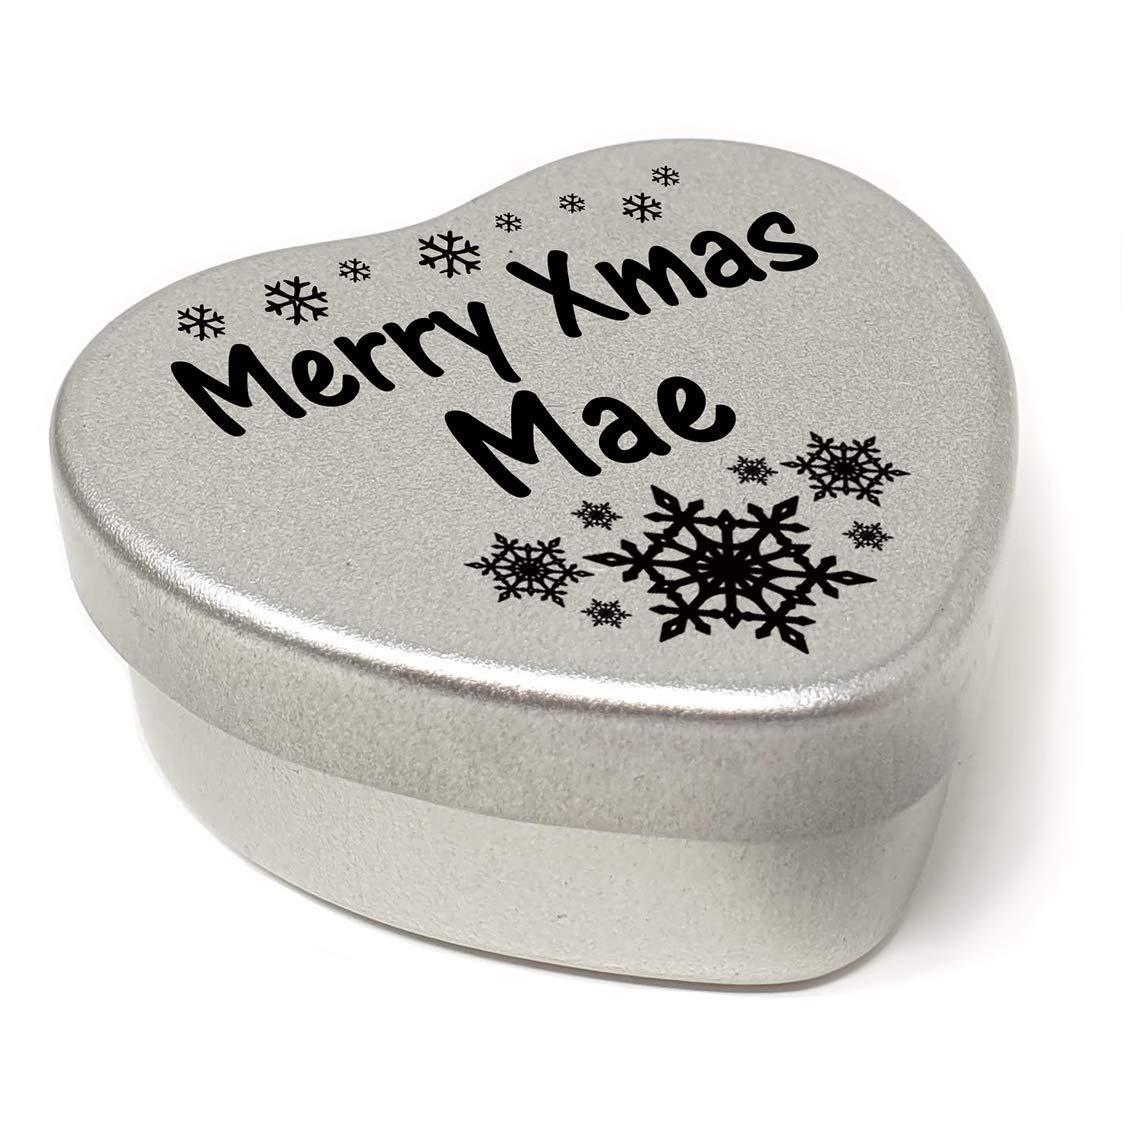 Merry Xmas Mae Heart Shaped Mini Tin Gift filled with mini coloured chocolates perfect card alternative for Mae Fun Festive Snowflakes Design